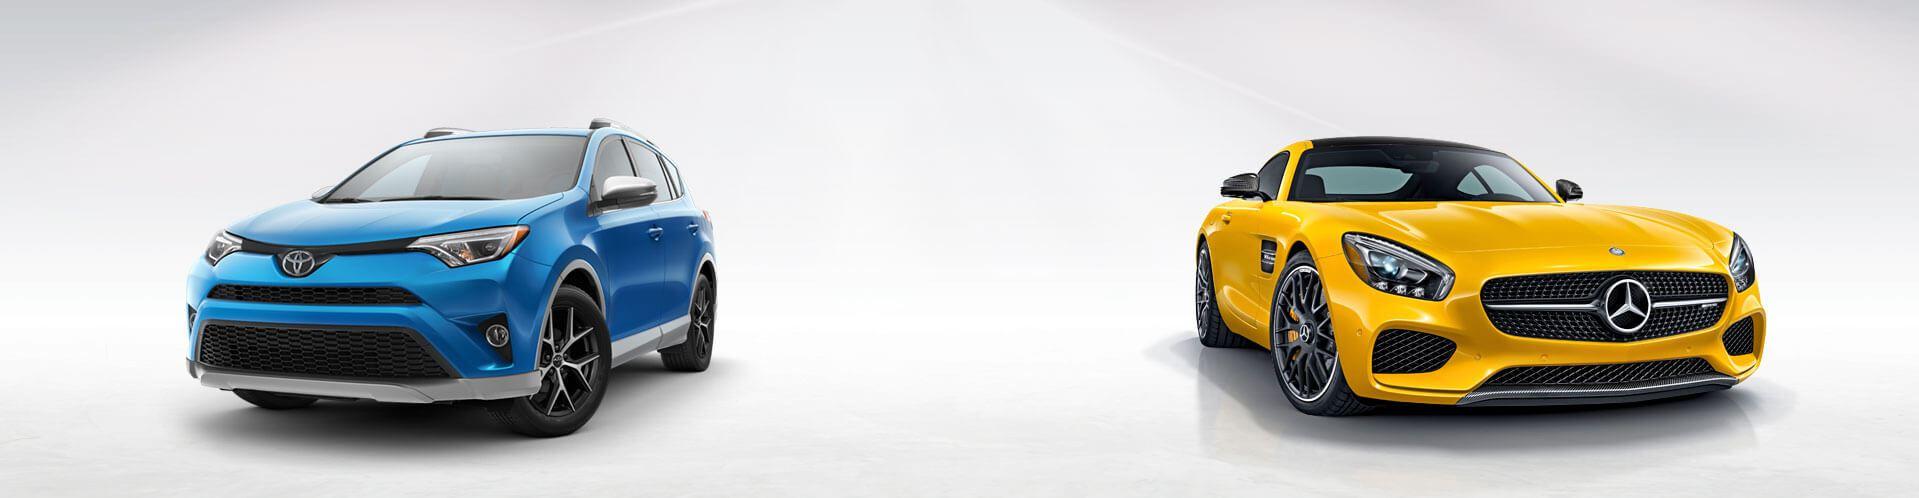 Prime Motor Group Acura Audi Buick Ford Genesis Gmc Honda Hyundai Mazda Mercedes Benz